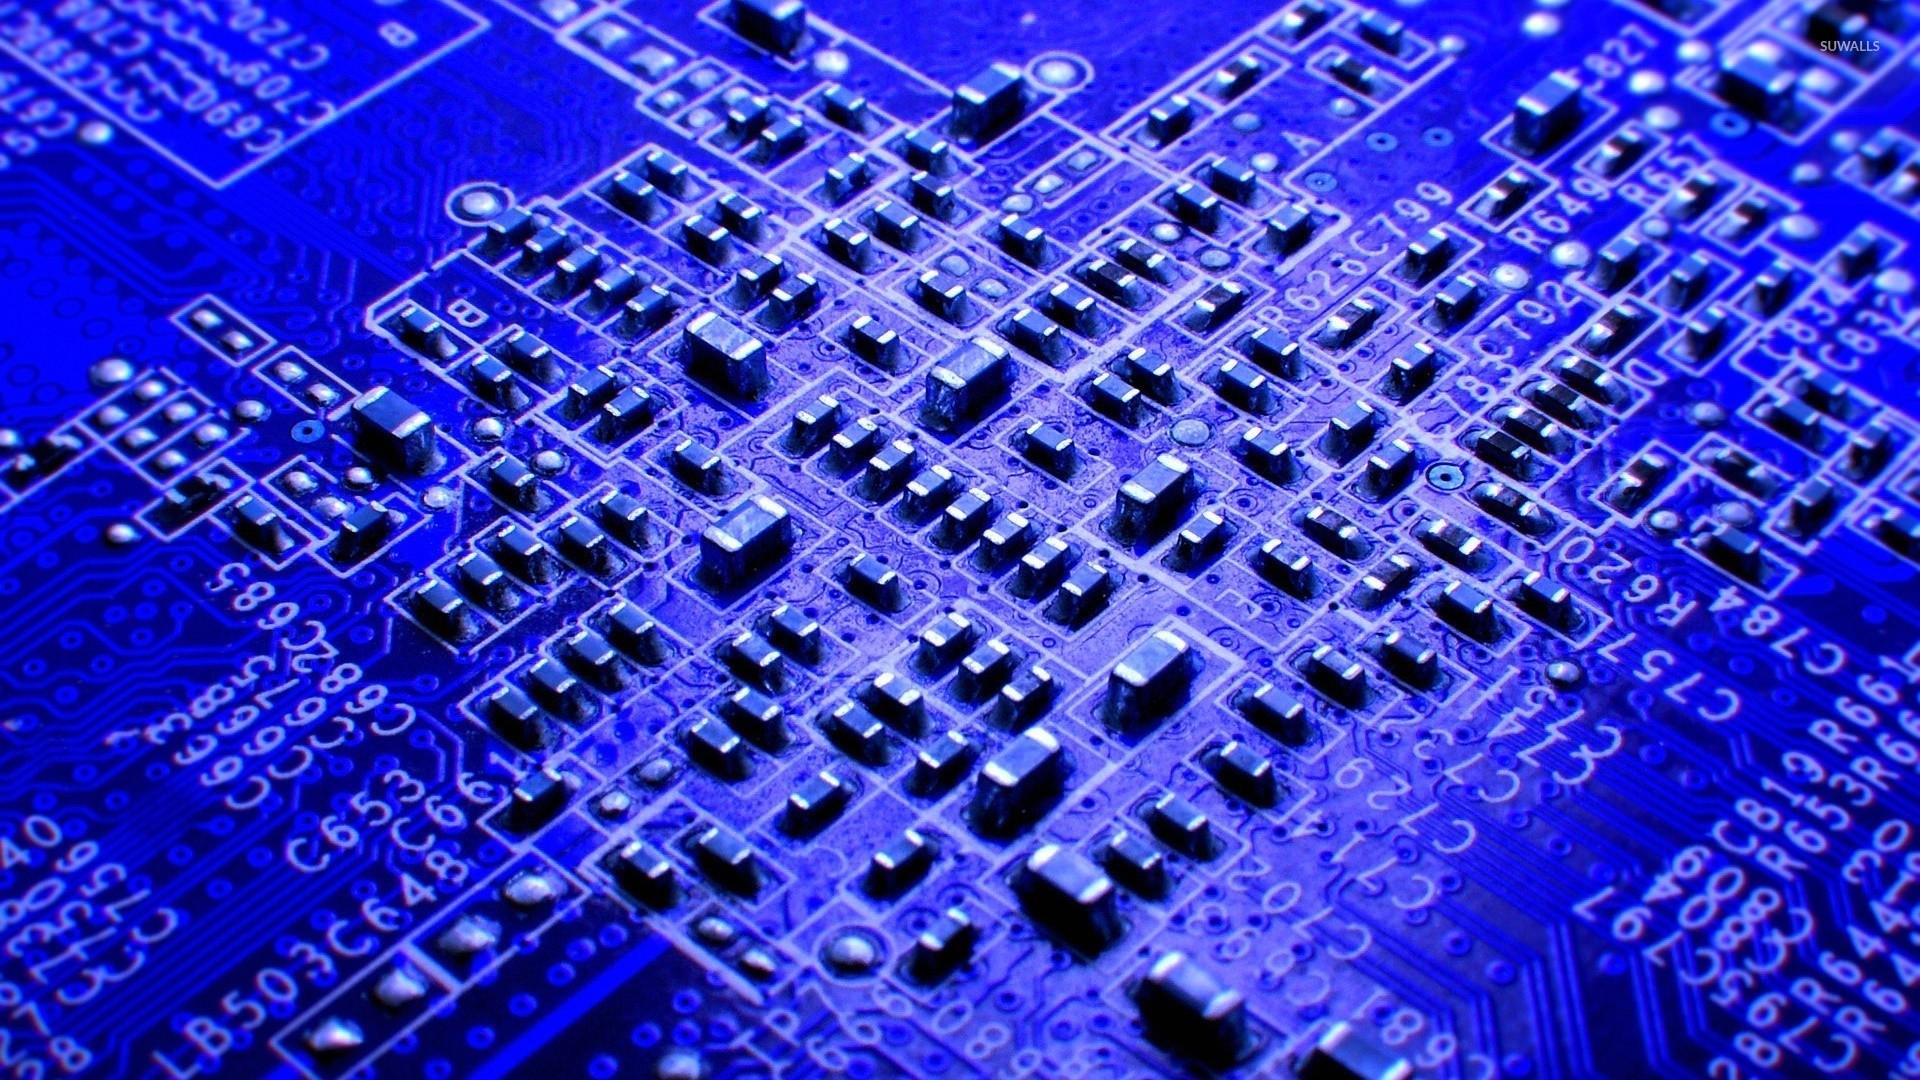 Circuit Board HD Wallpaper